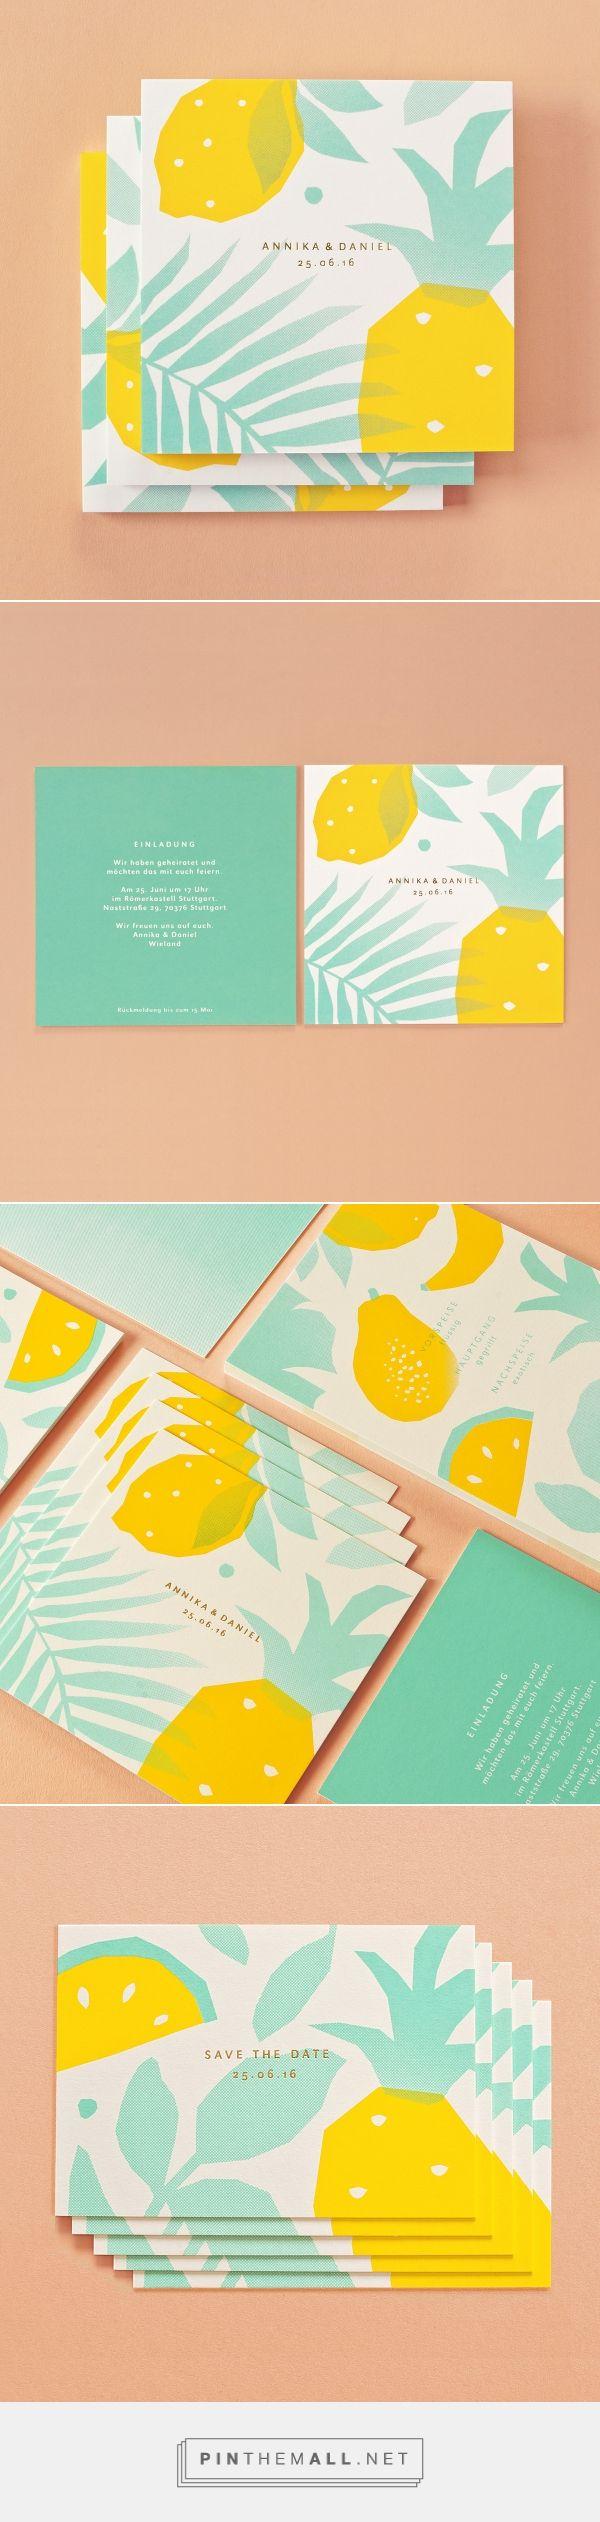 Tropical Wedding by Sunda Studio | Fivestar Branding Agency – Design and Brandin